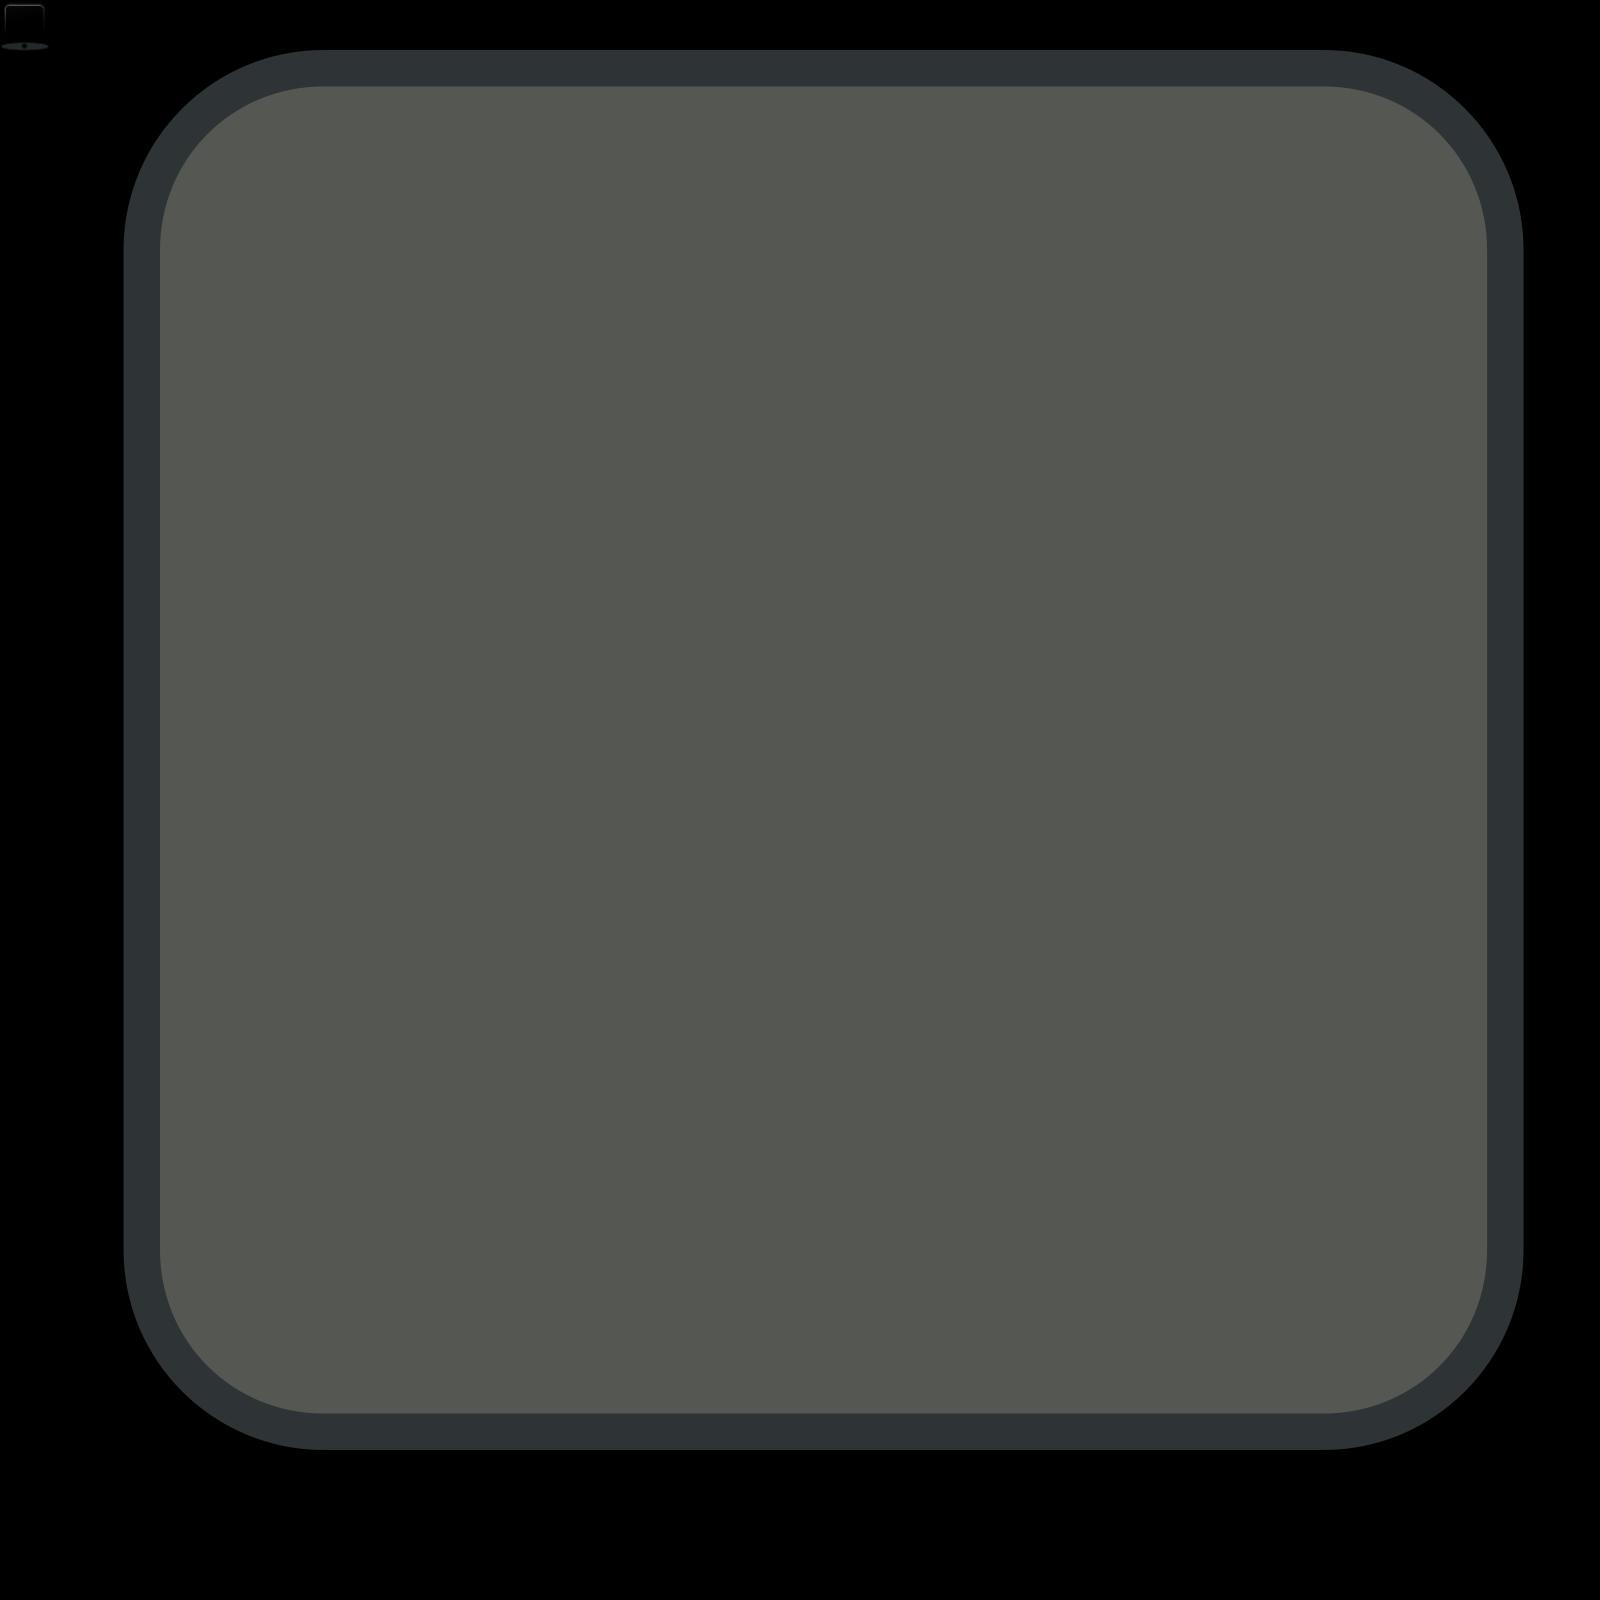 Grey Button SVG Clip arts